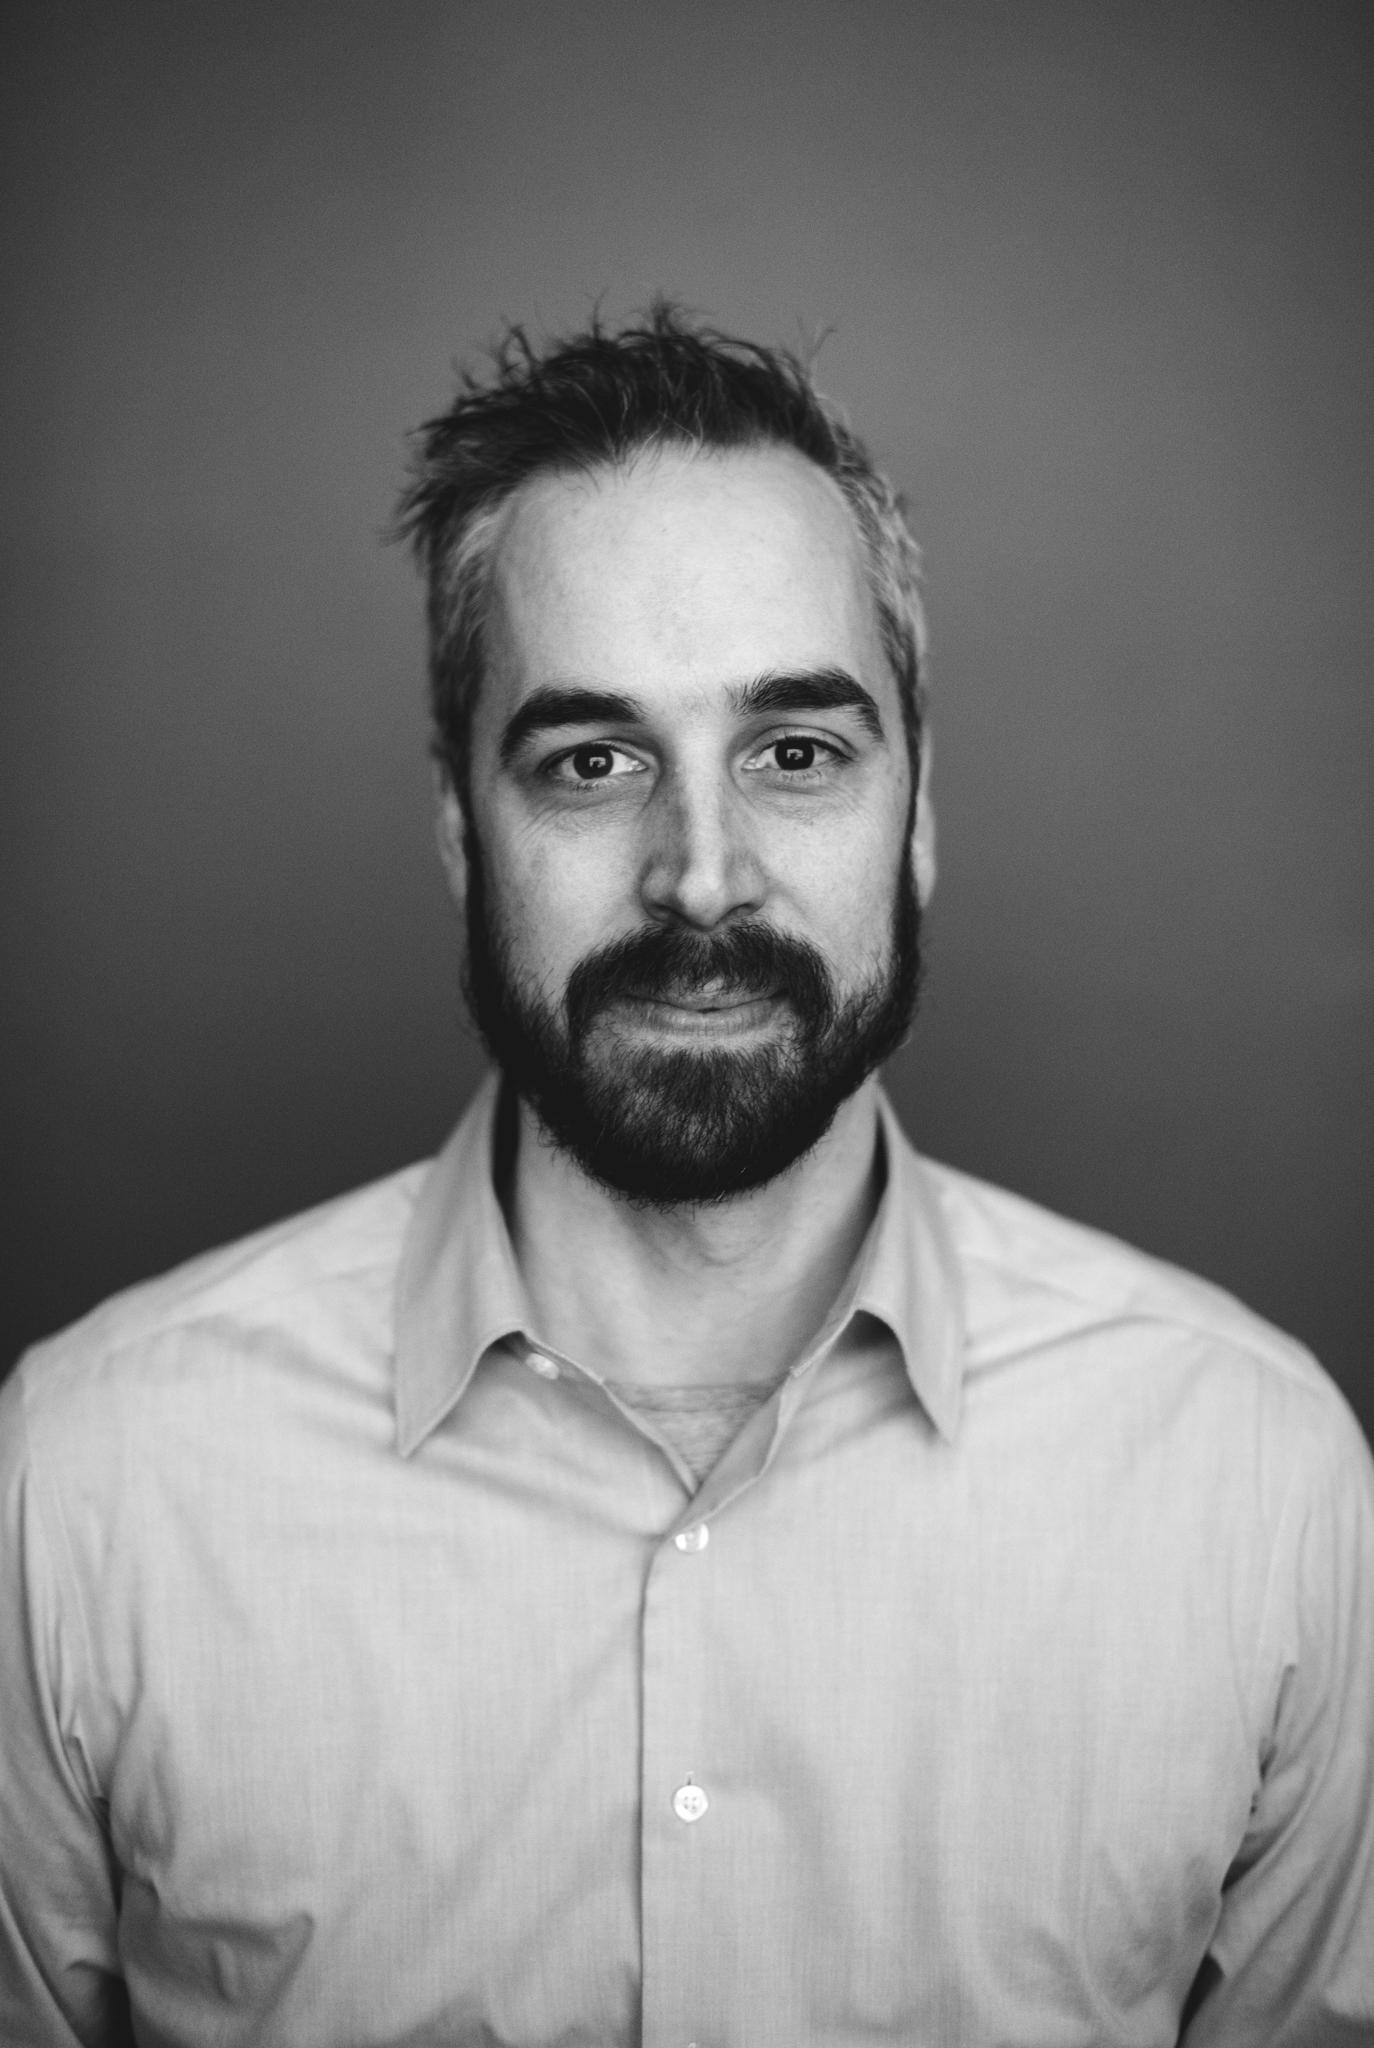 Nate portraits - 44.jpg